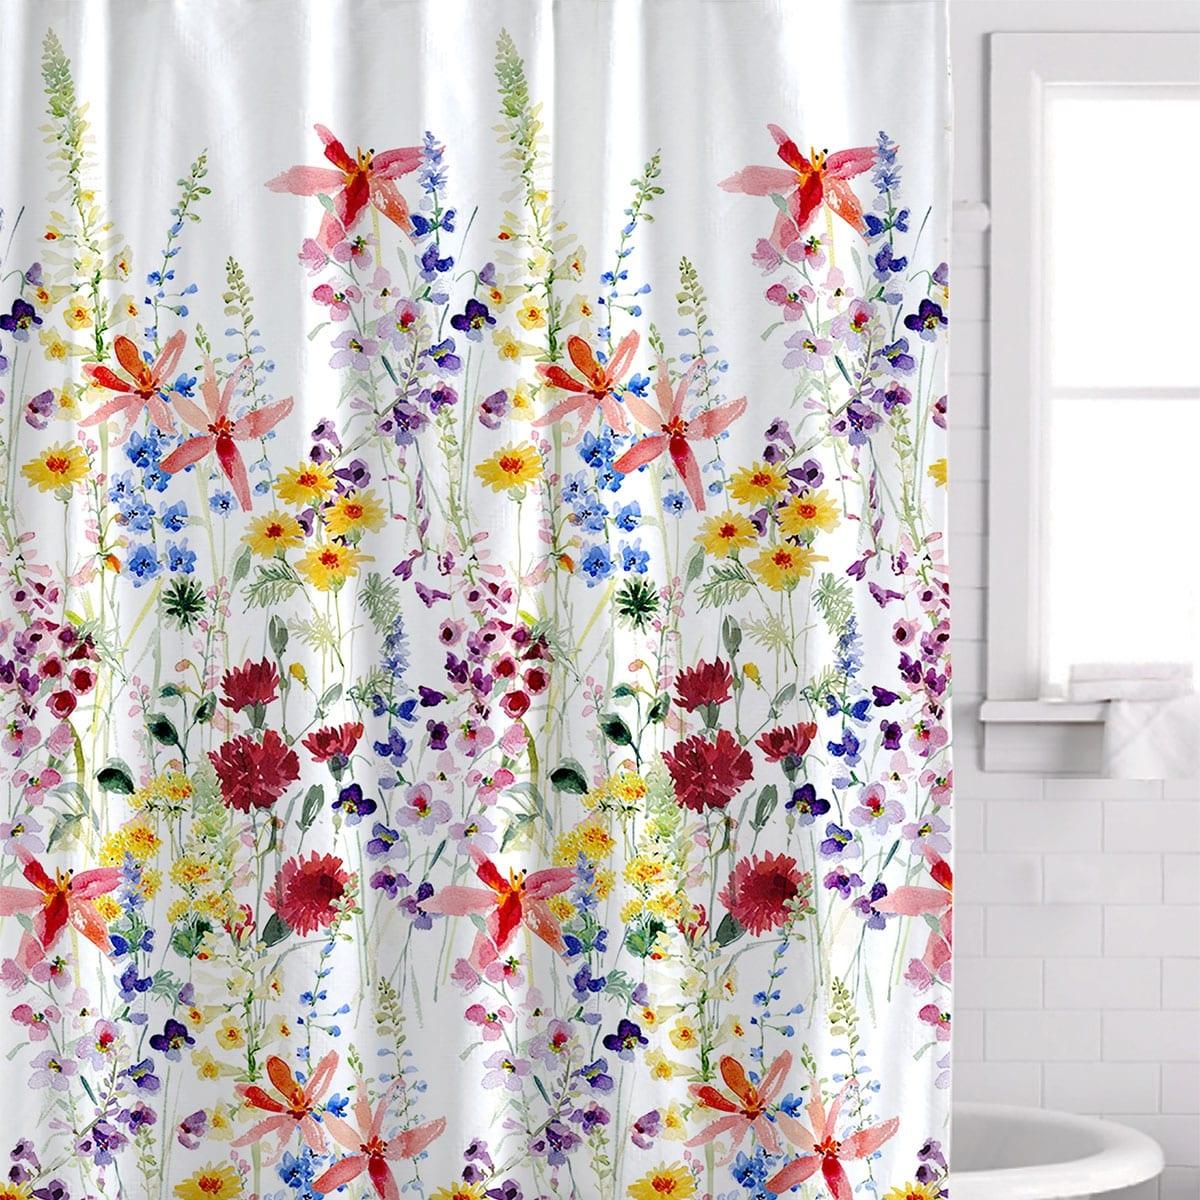 Watercolor Poppy Flower Waterproof Fabric Shower Curtain Liner Bath Accessory